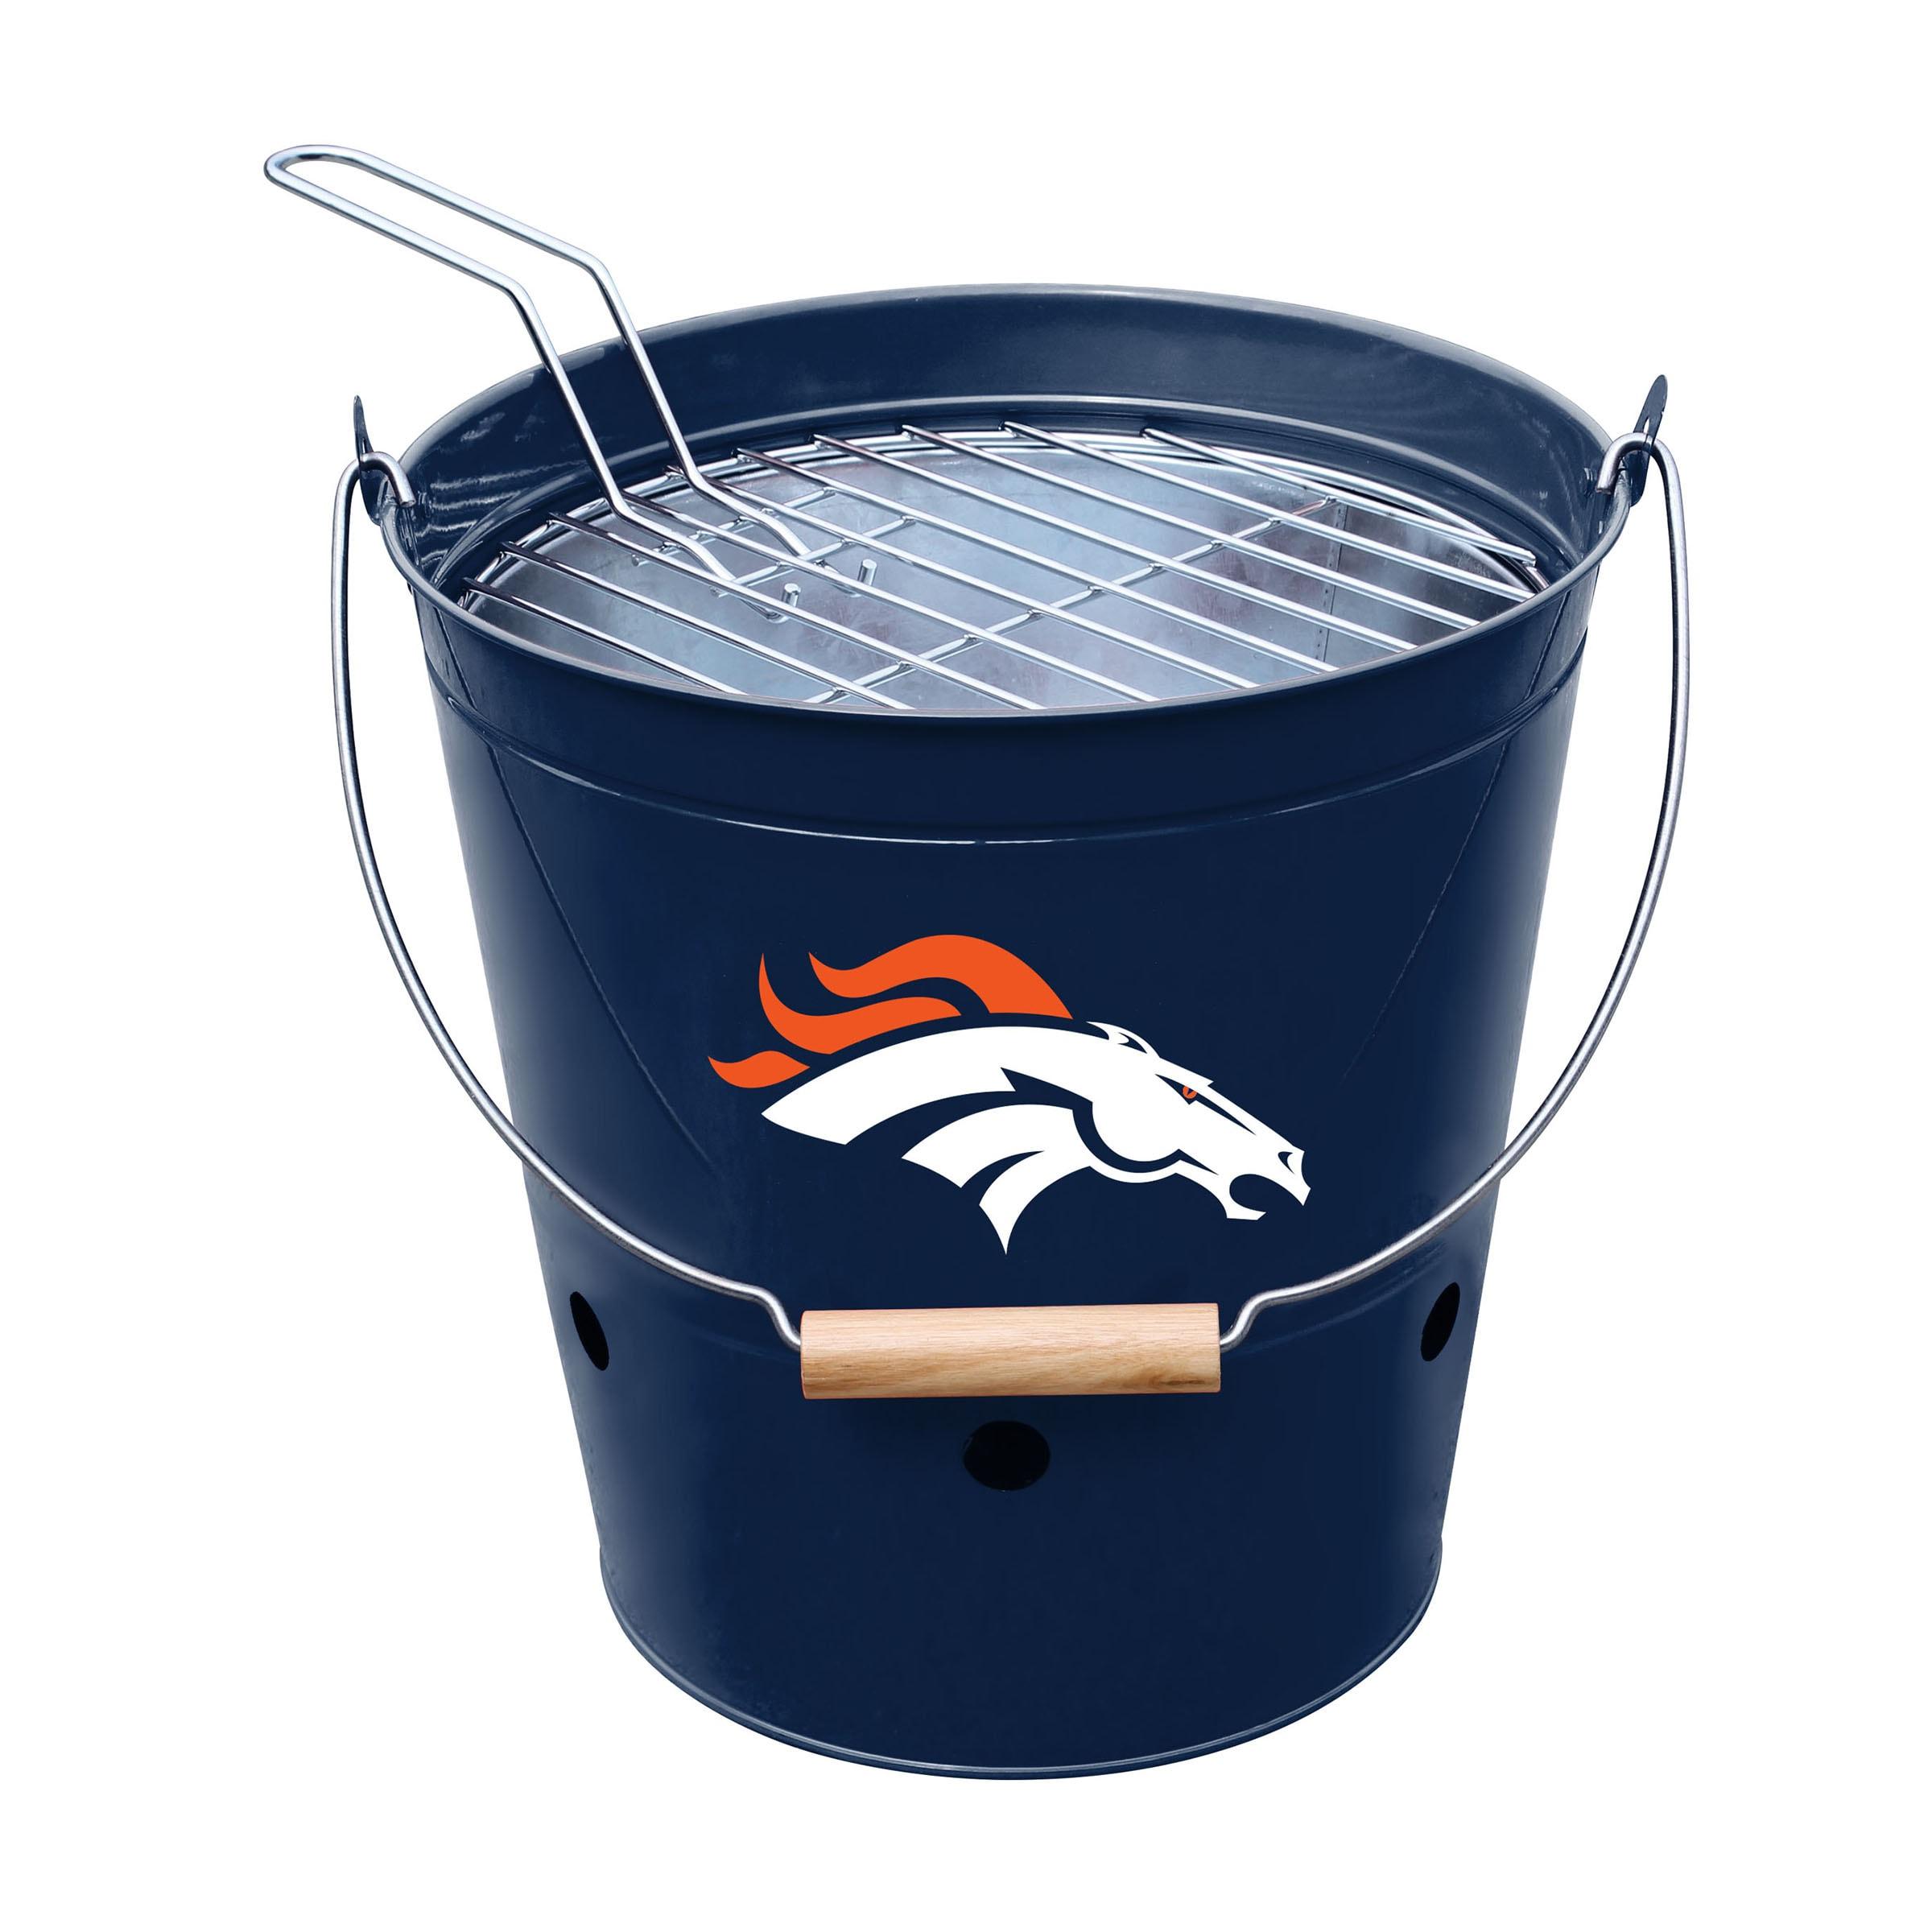 Denver Broncos Imperial Bucket Grill - Blue